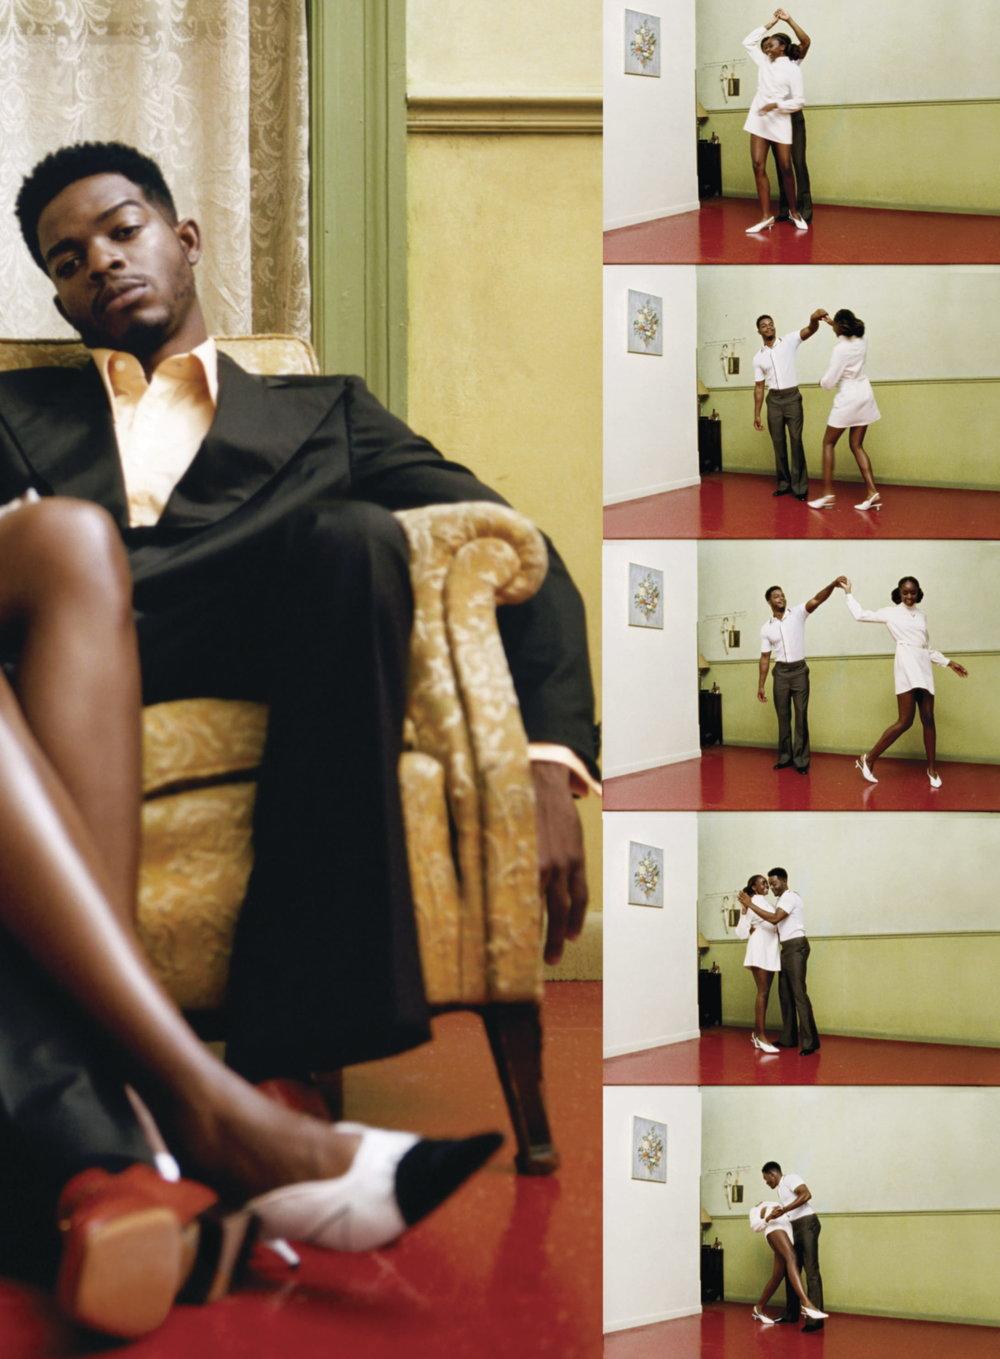 Kiki Layne, Stephan James by Tyler Mitchell for Vogue US Jan 2019 (5).jpg